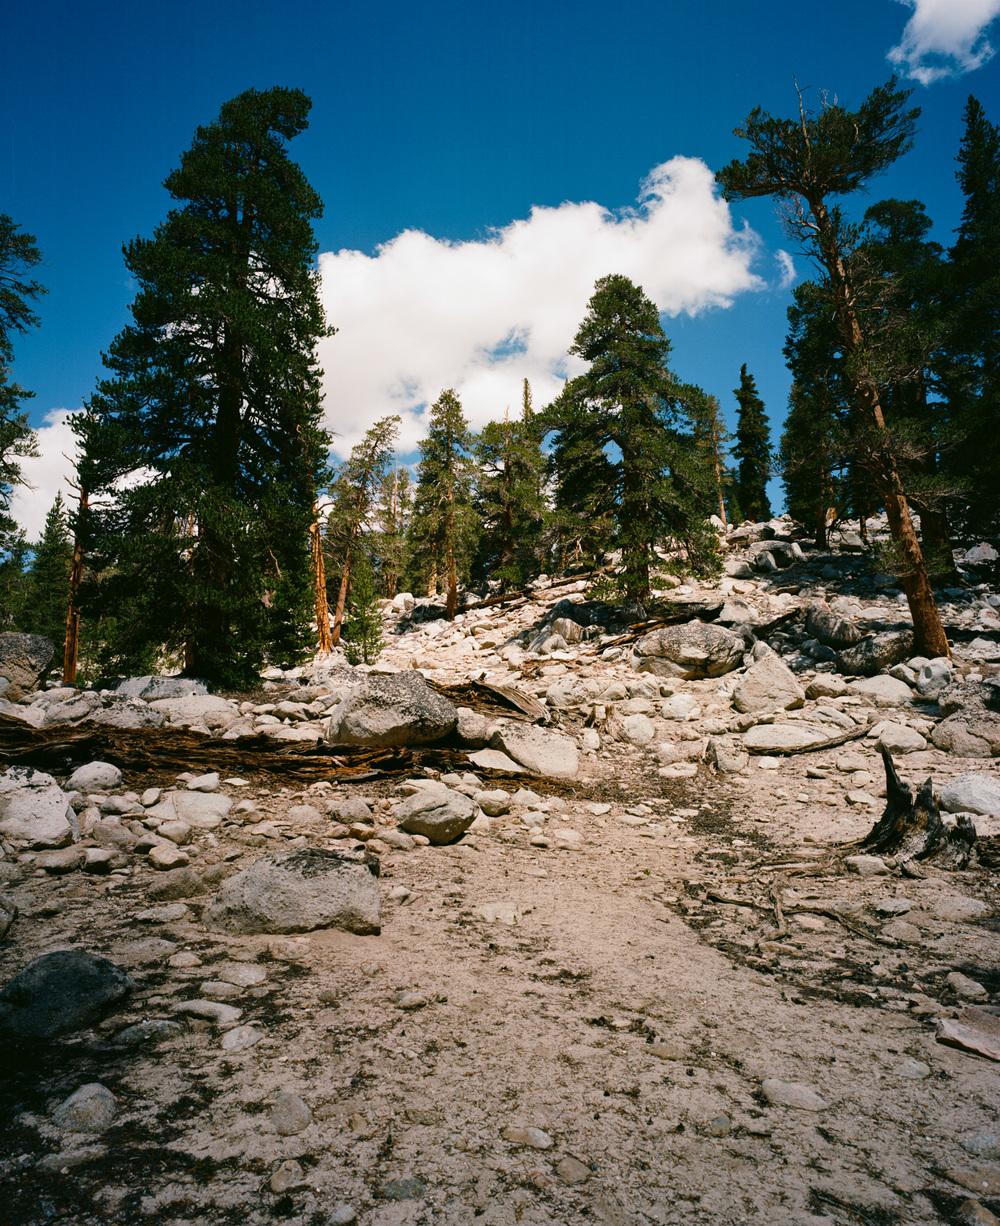 Sierras-2.jpg